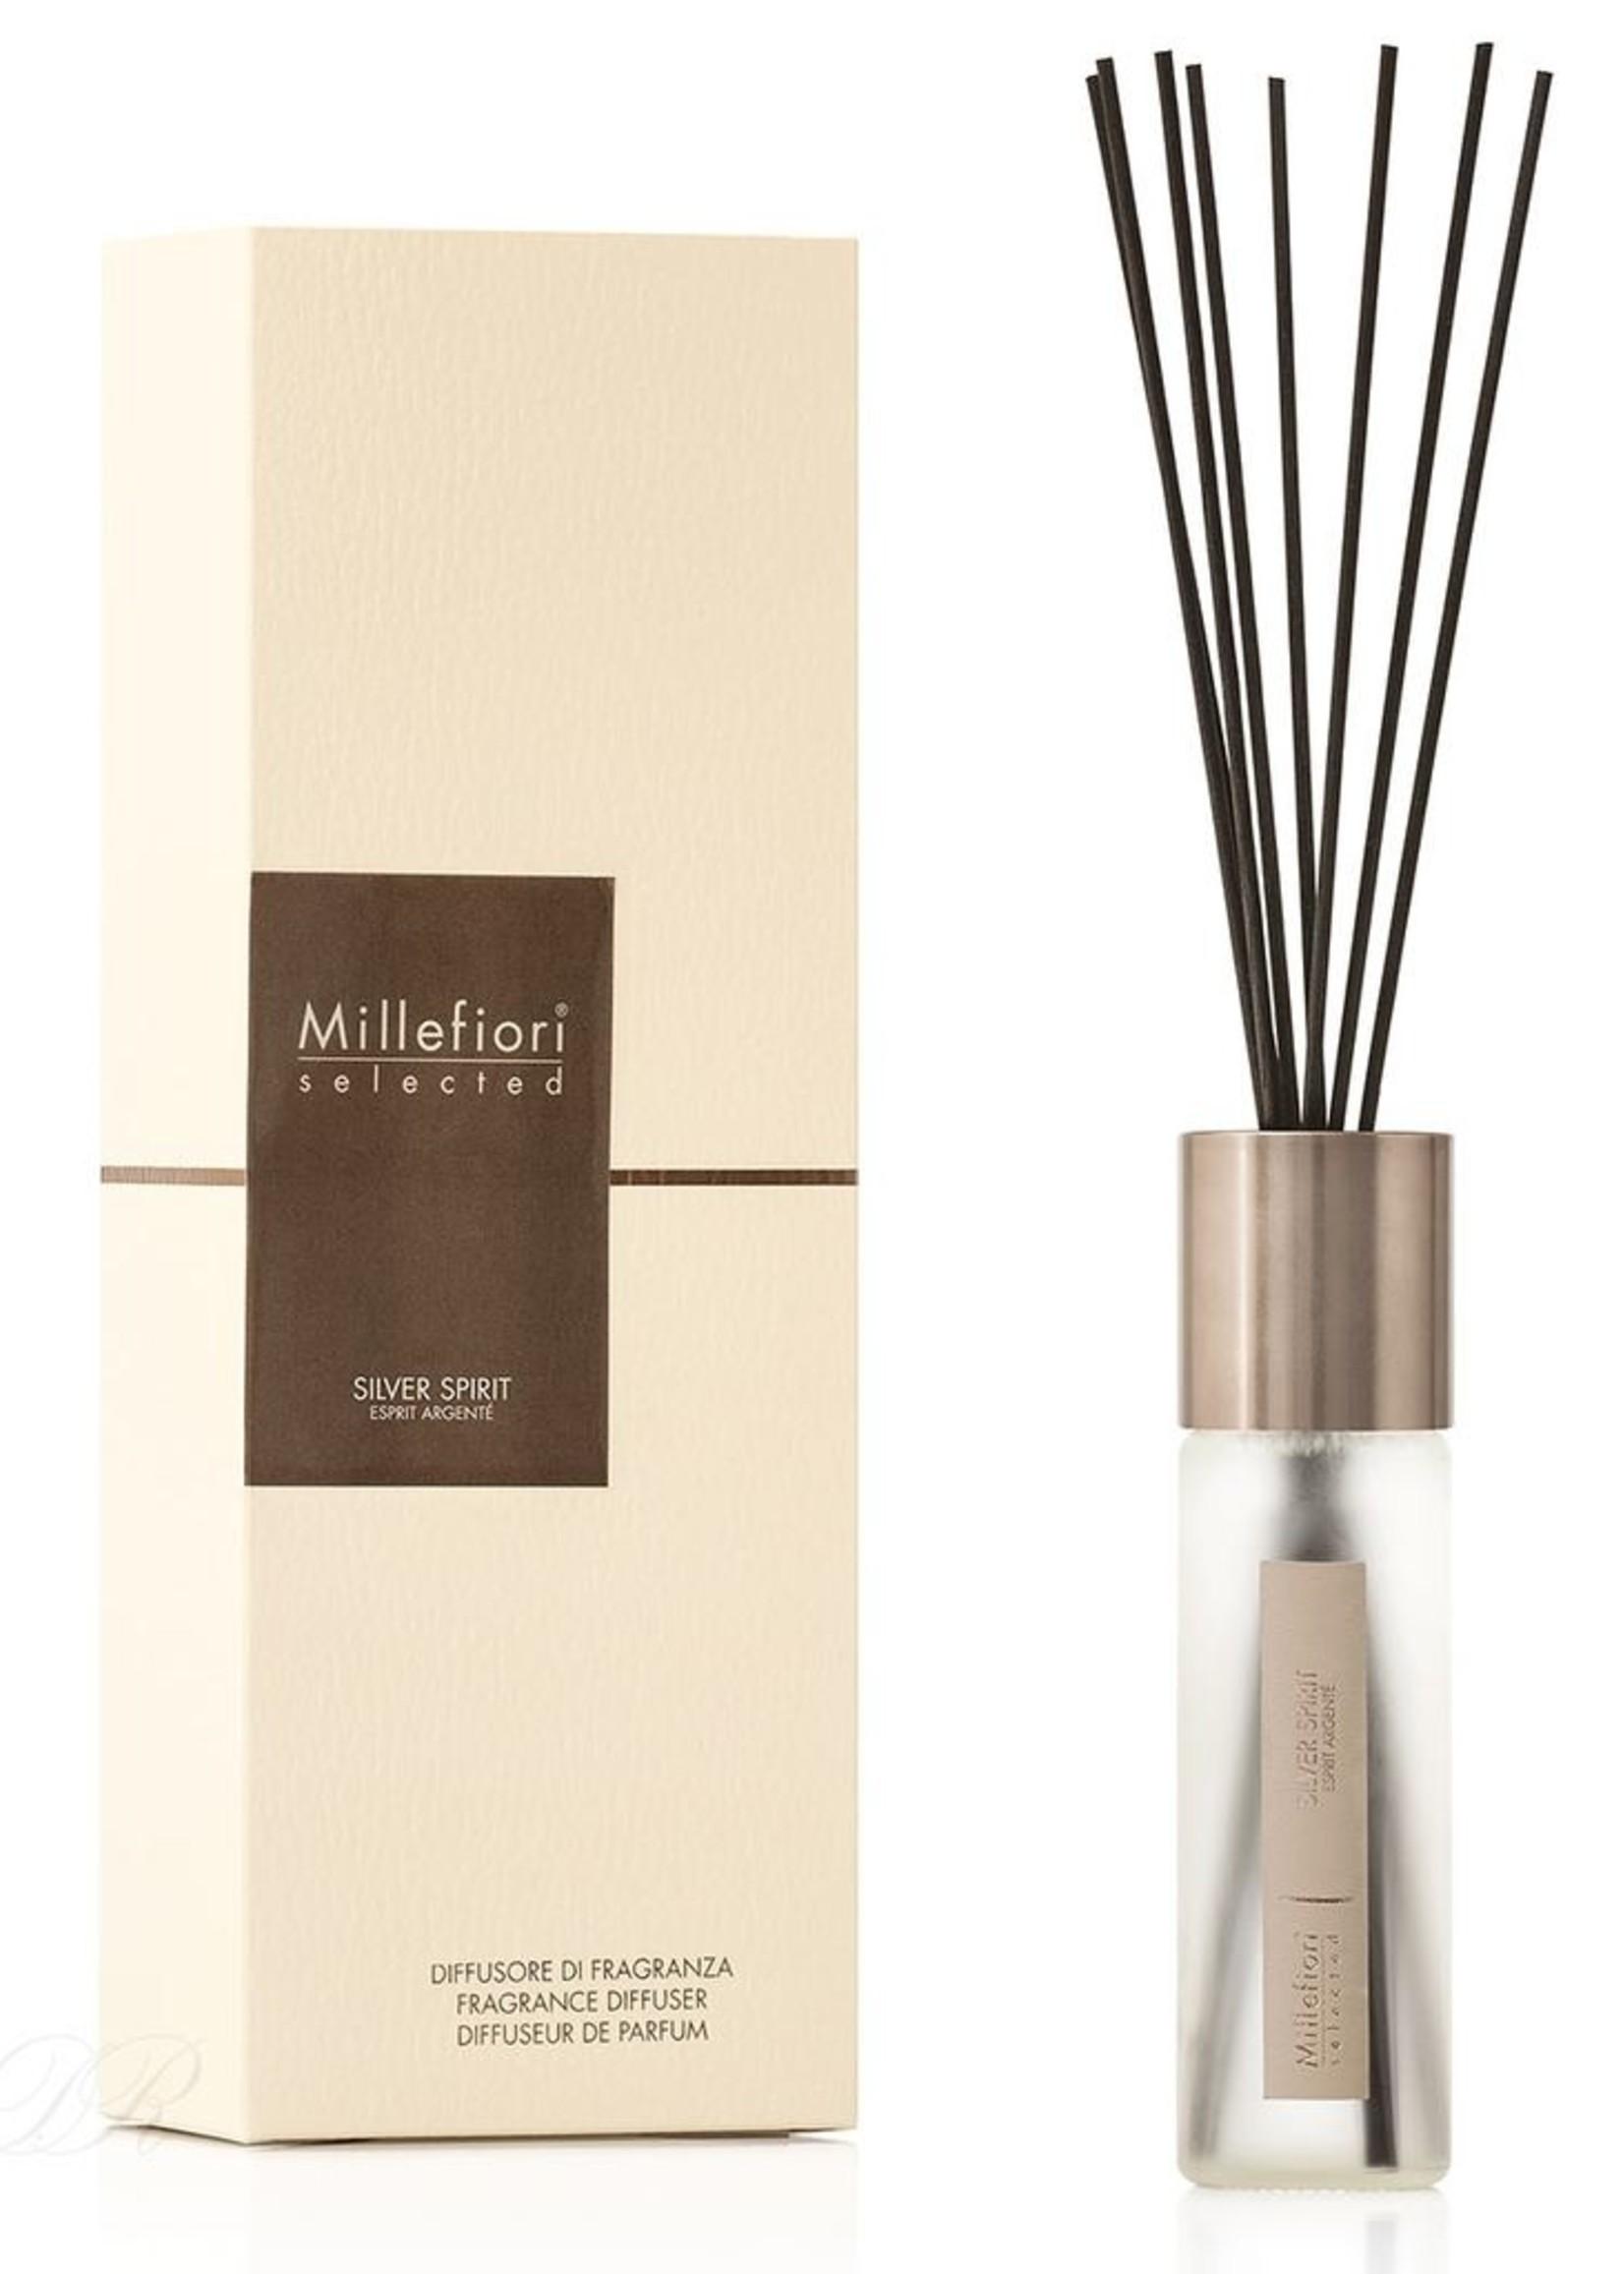 Millefiori selected diffuser 100 ml silver spirit